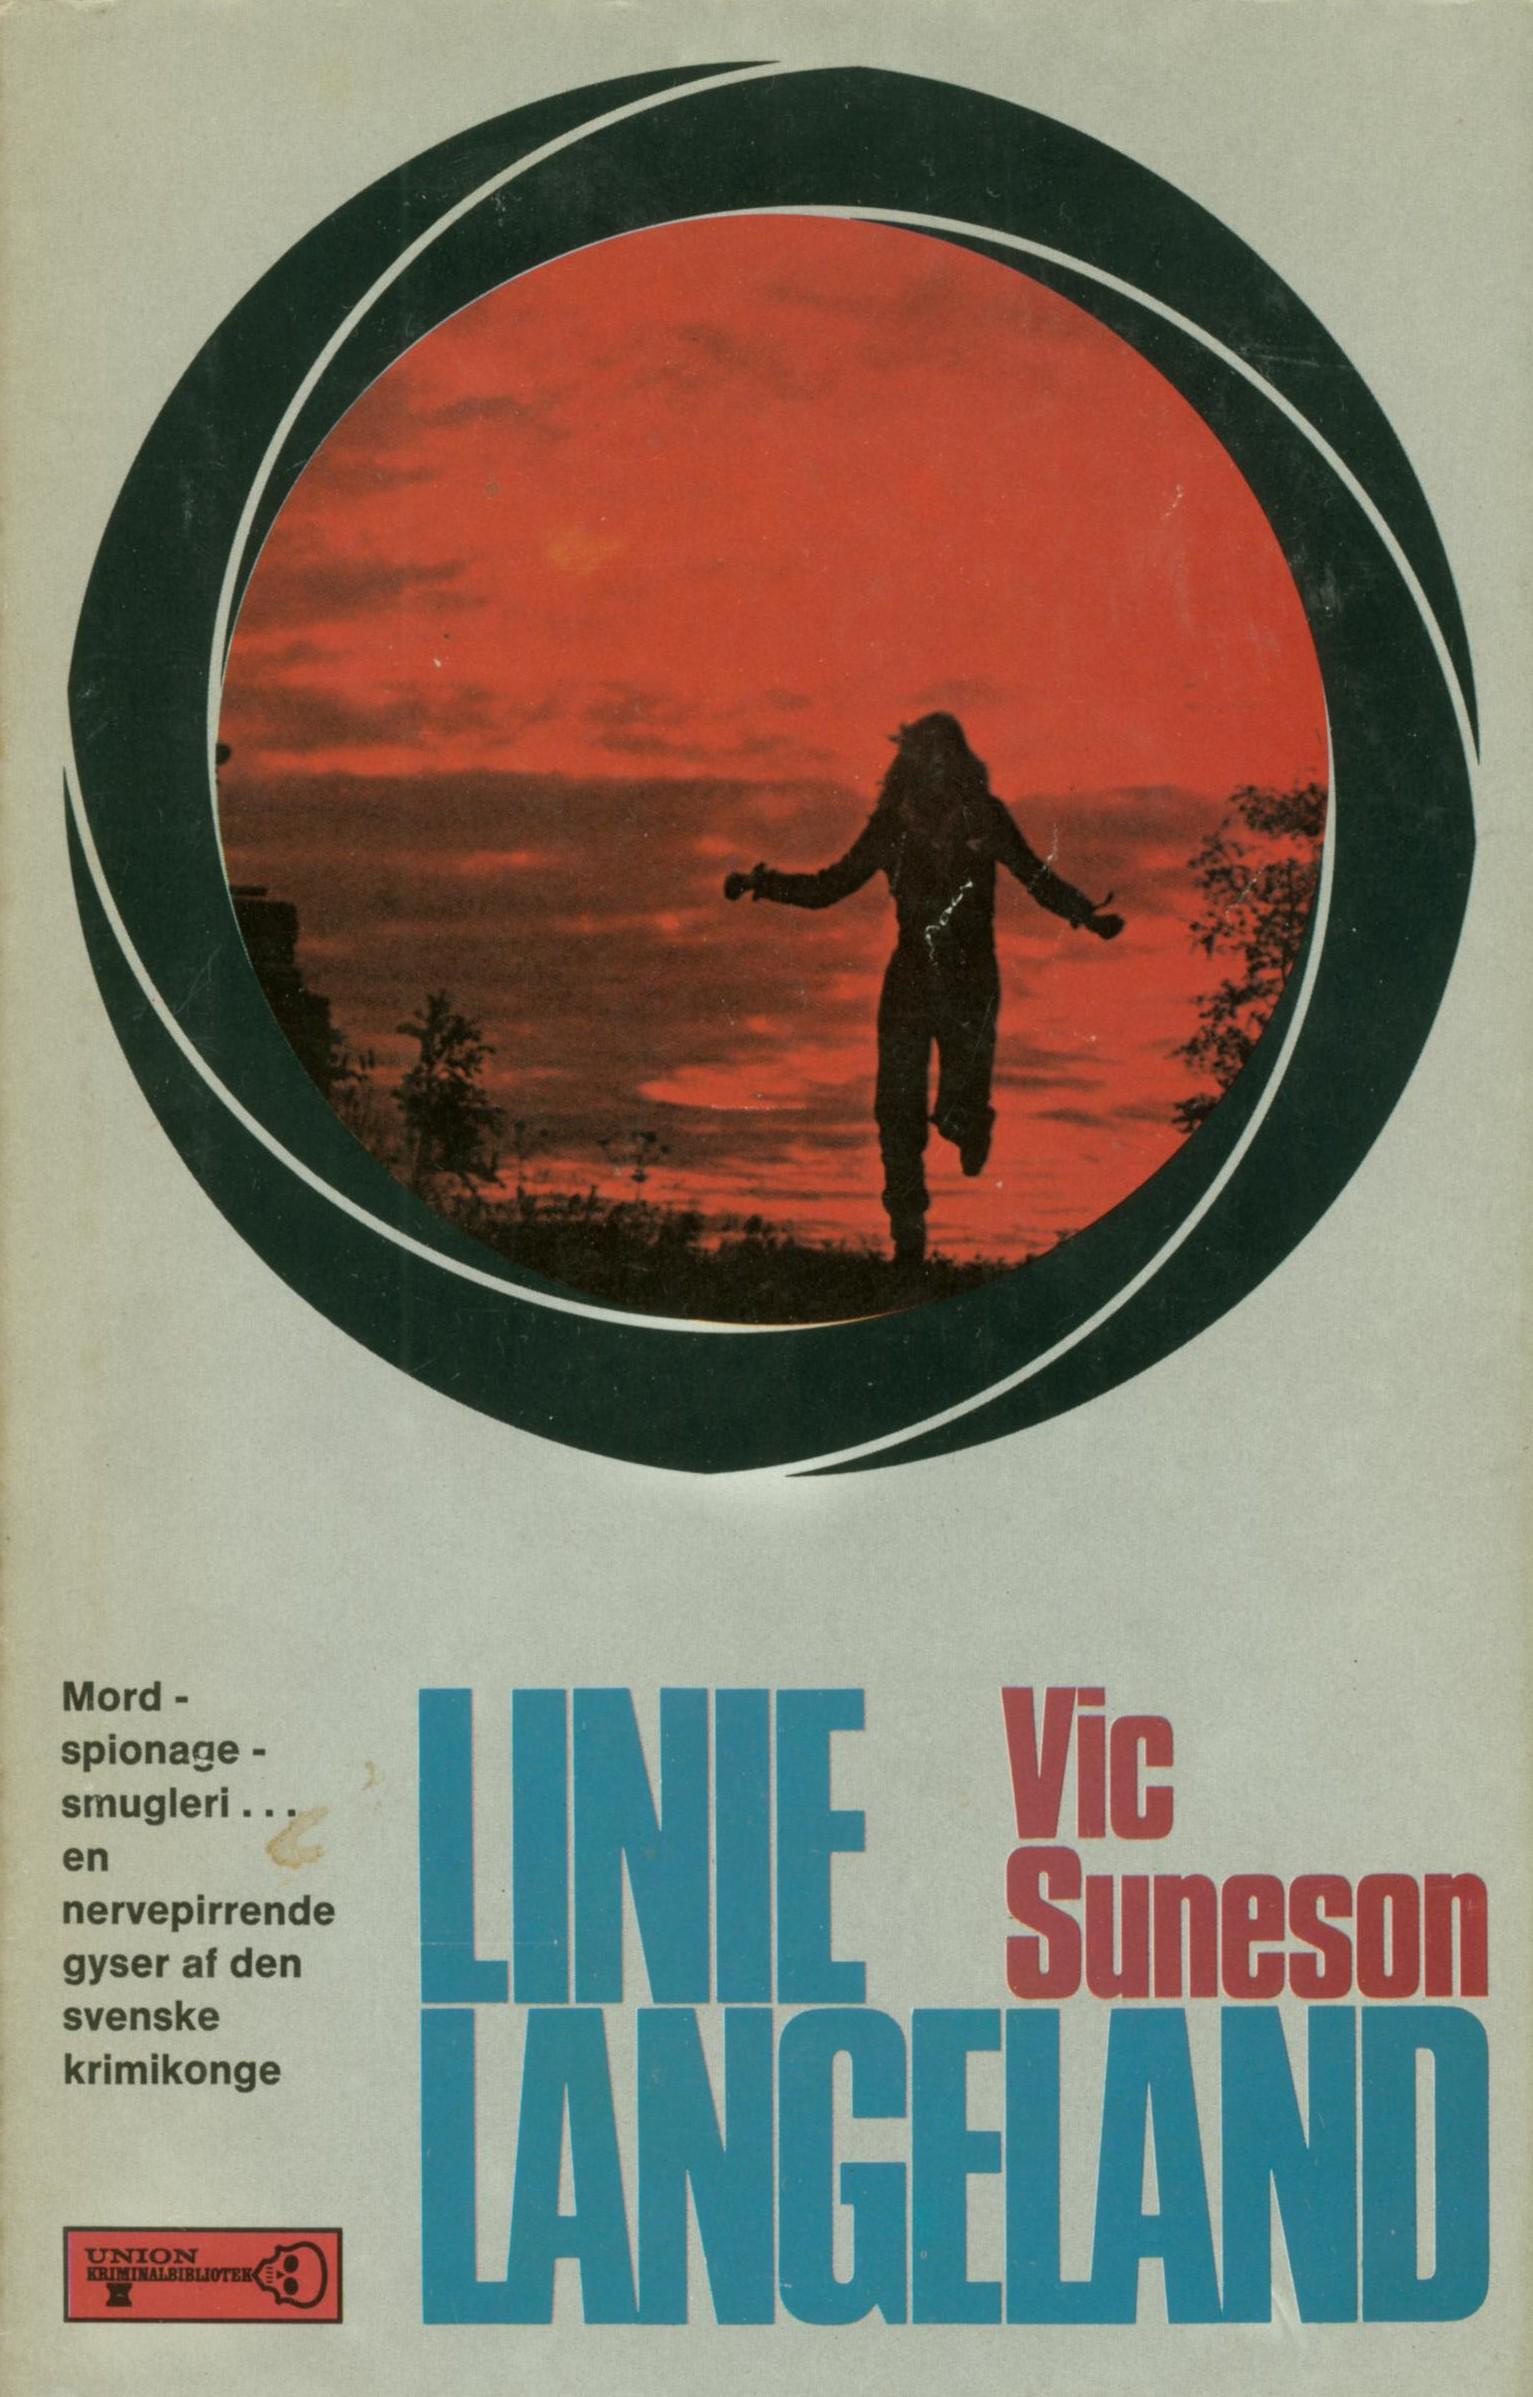 svenske kriminalromaner